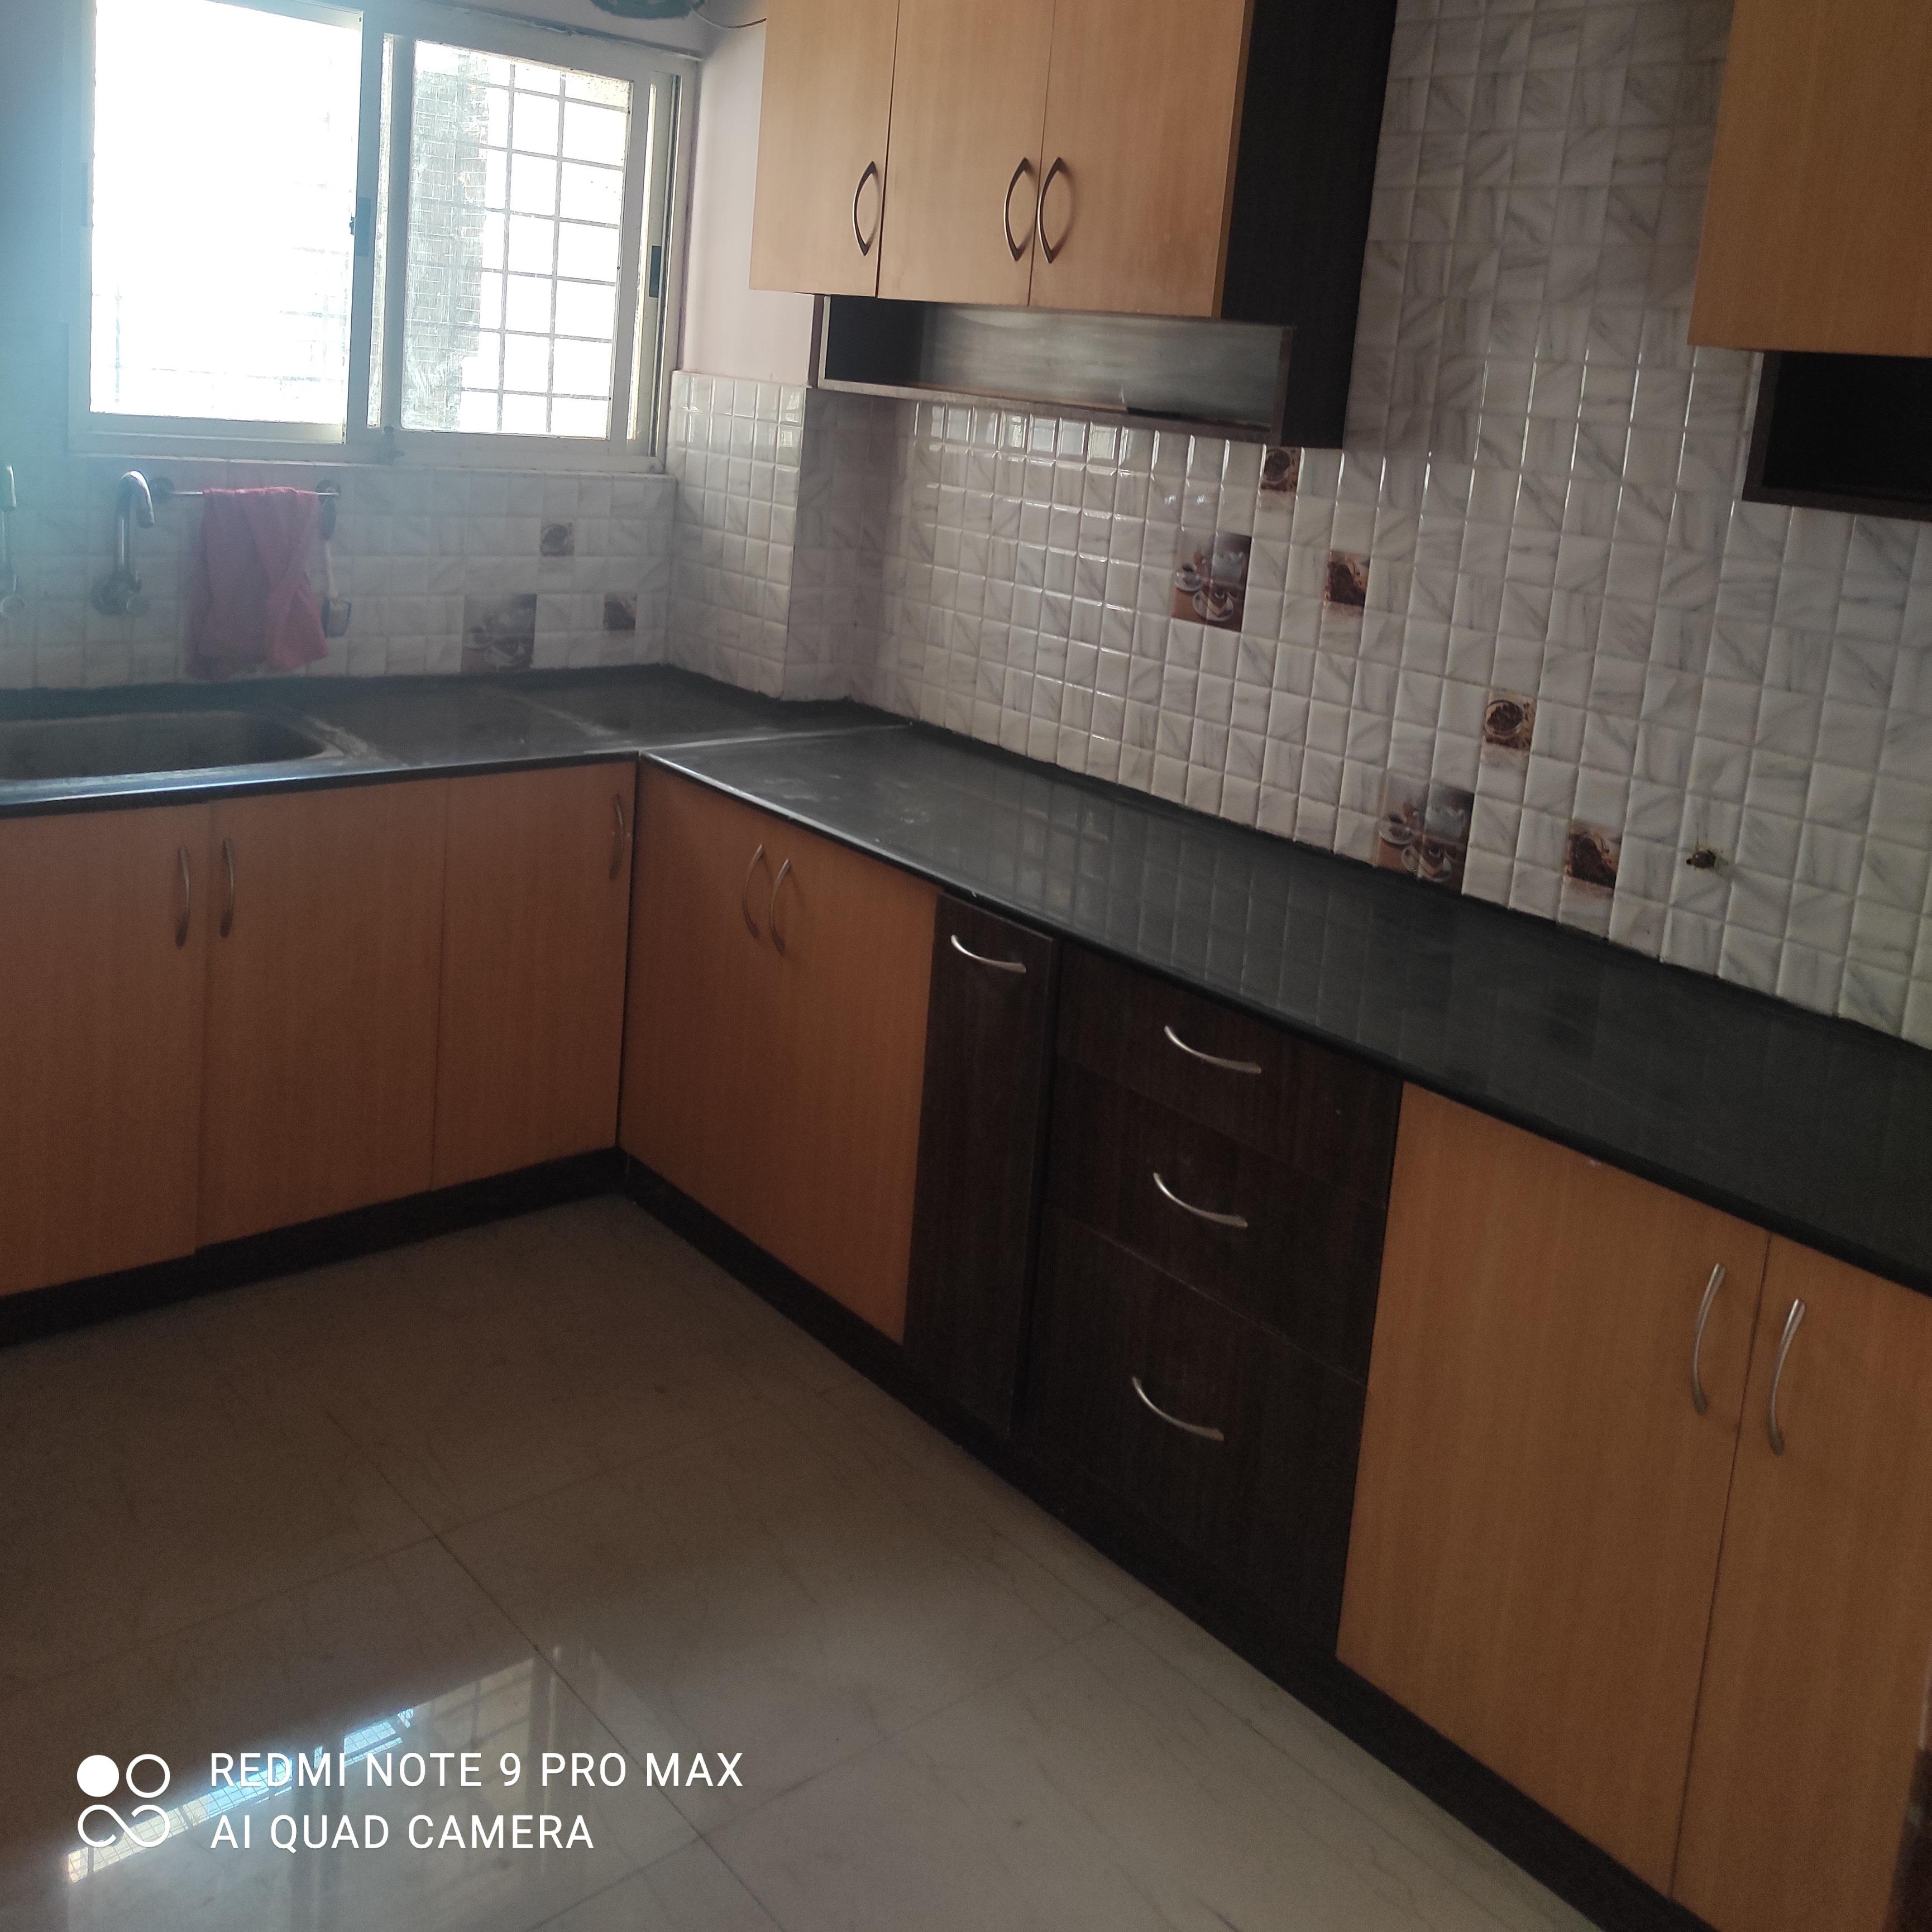 kitchen-Picture-banashankari-2654209